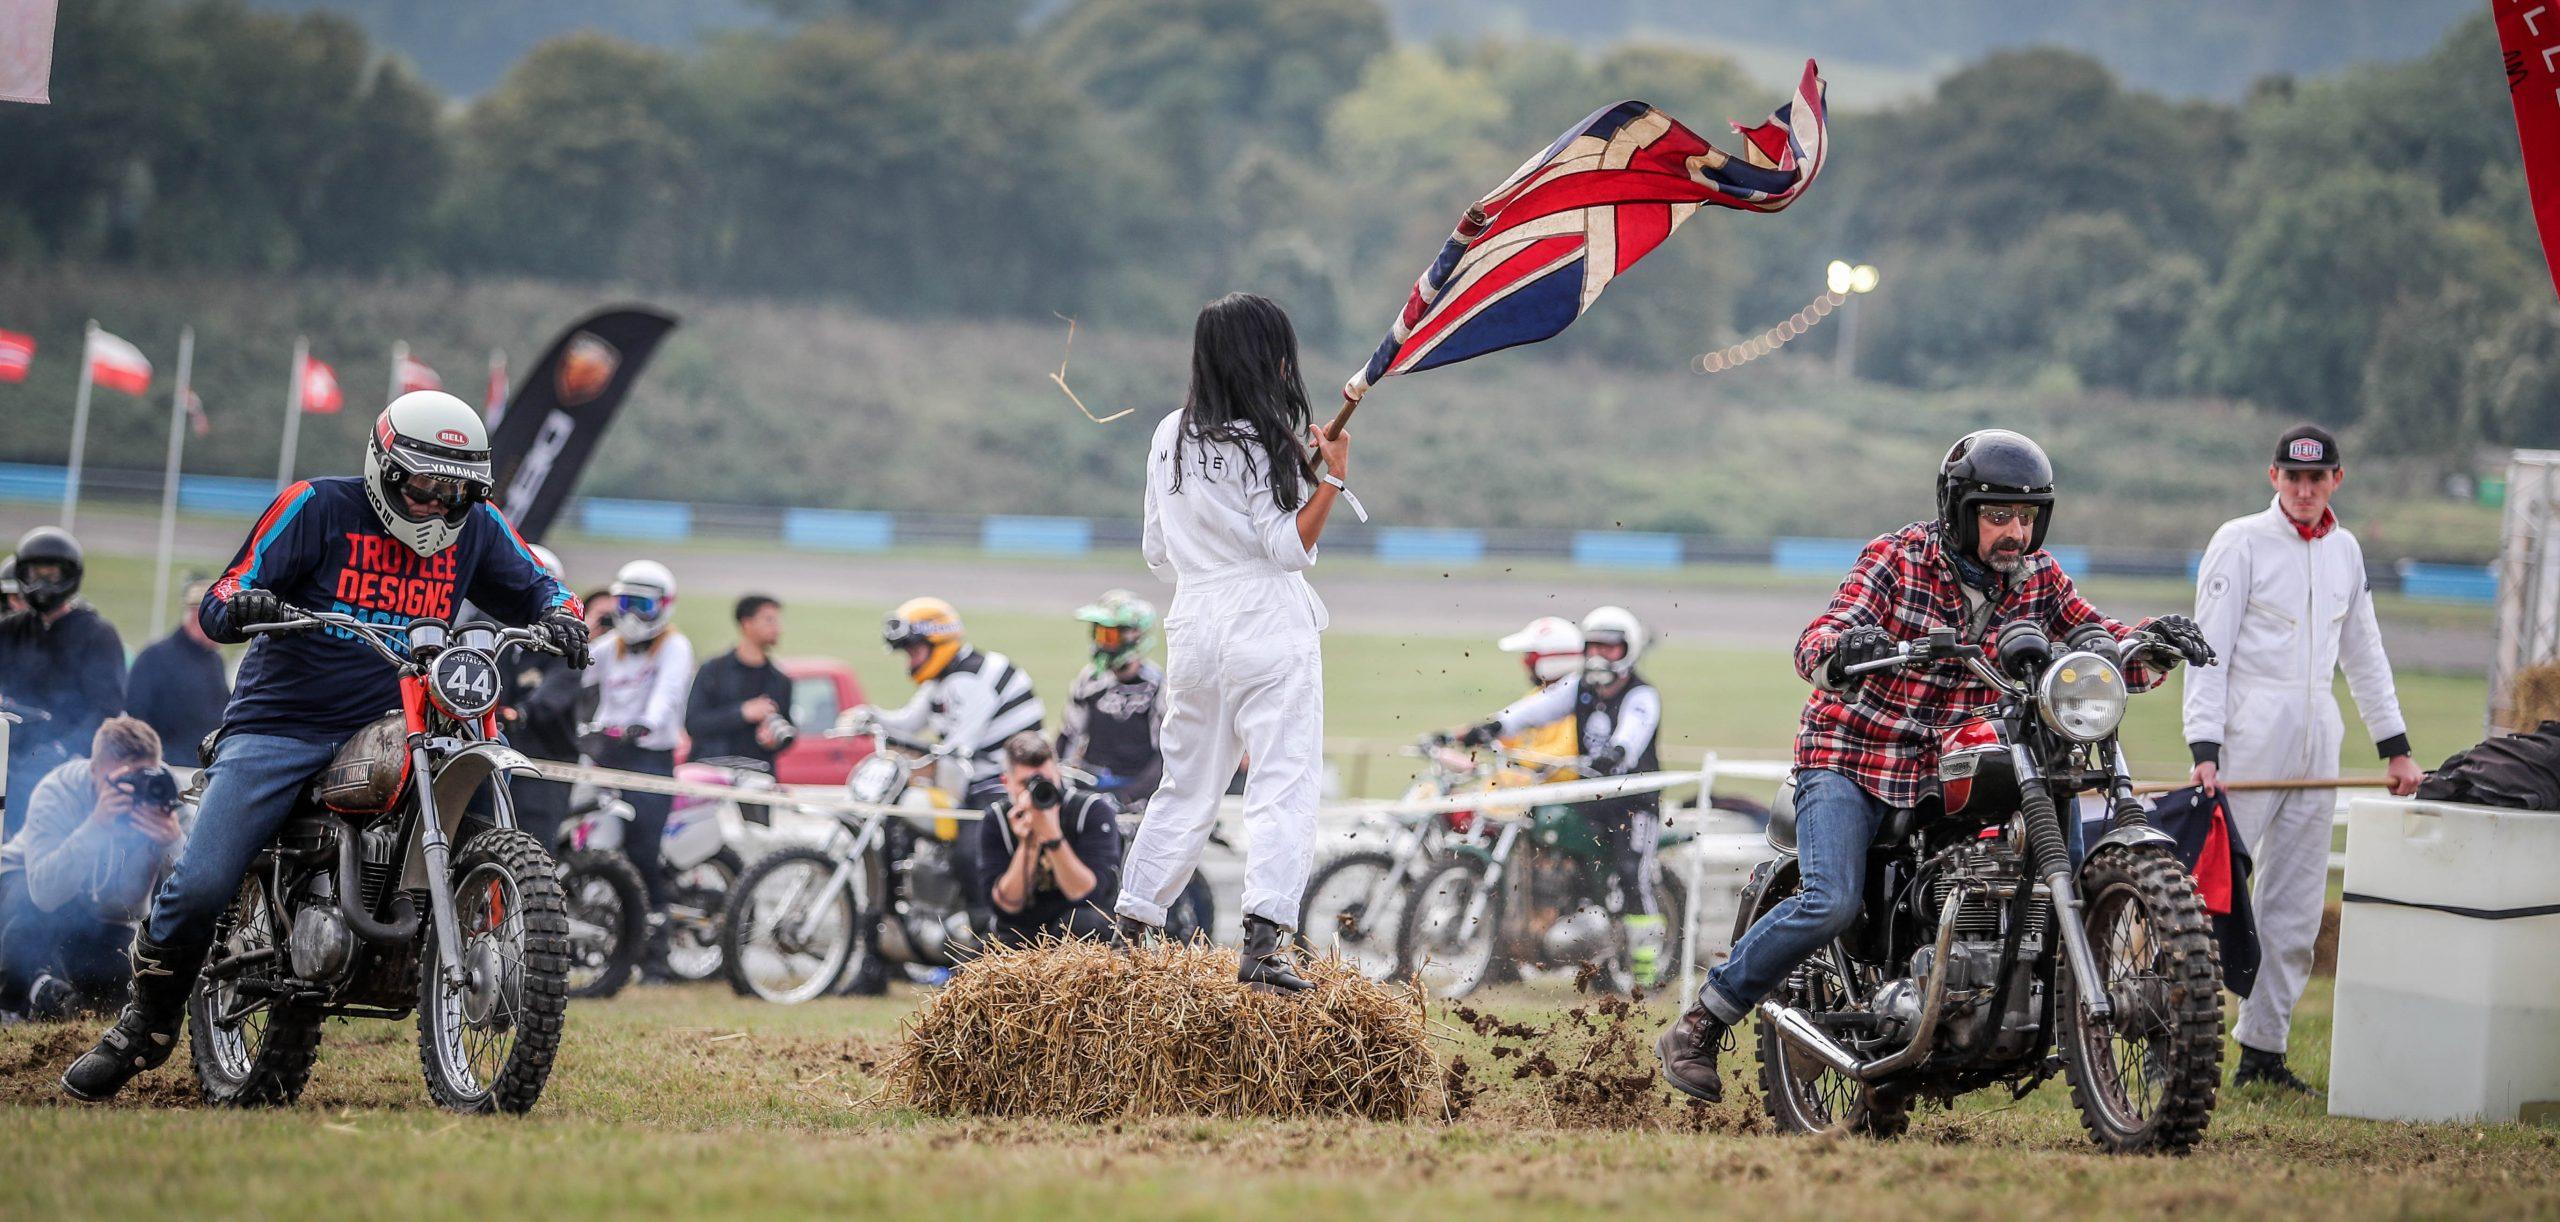 The Bike Shed Festival